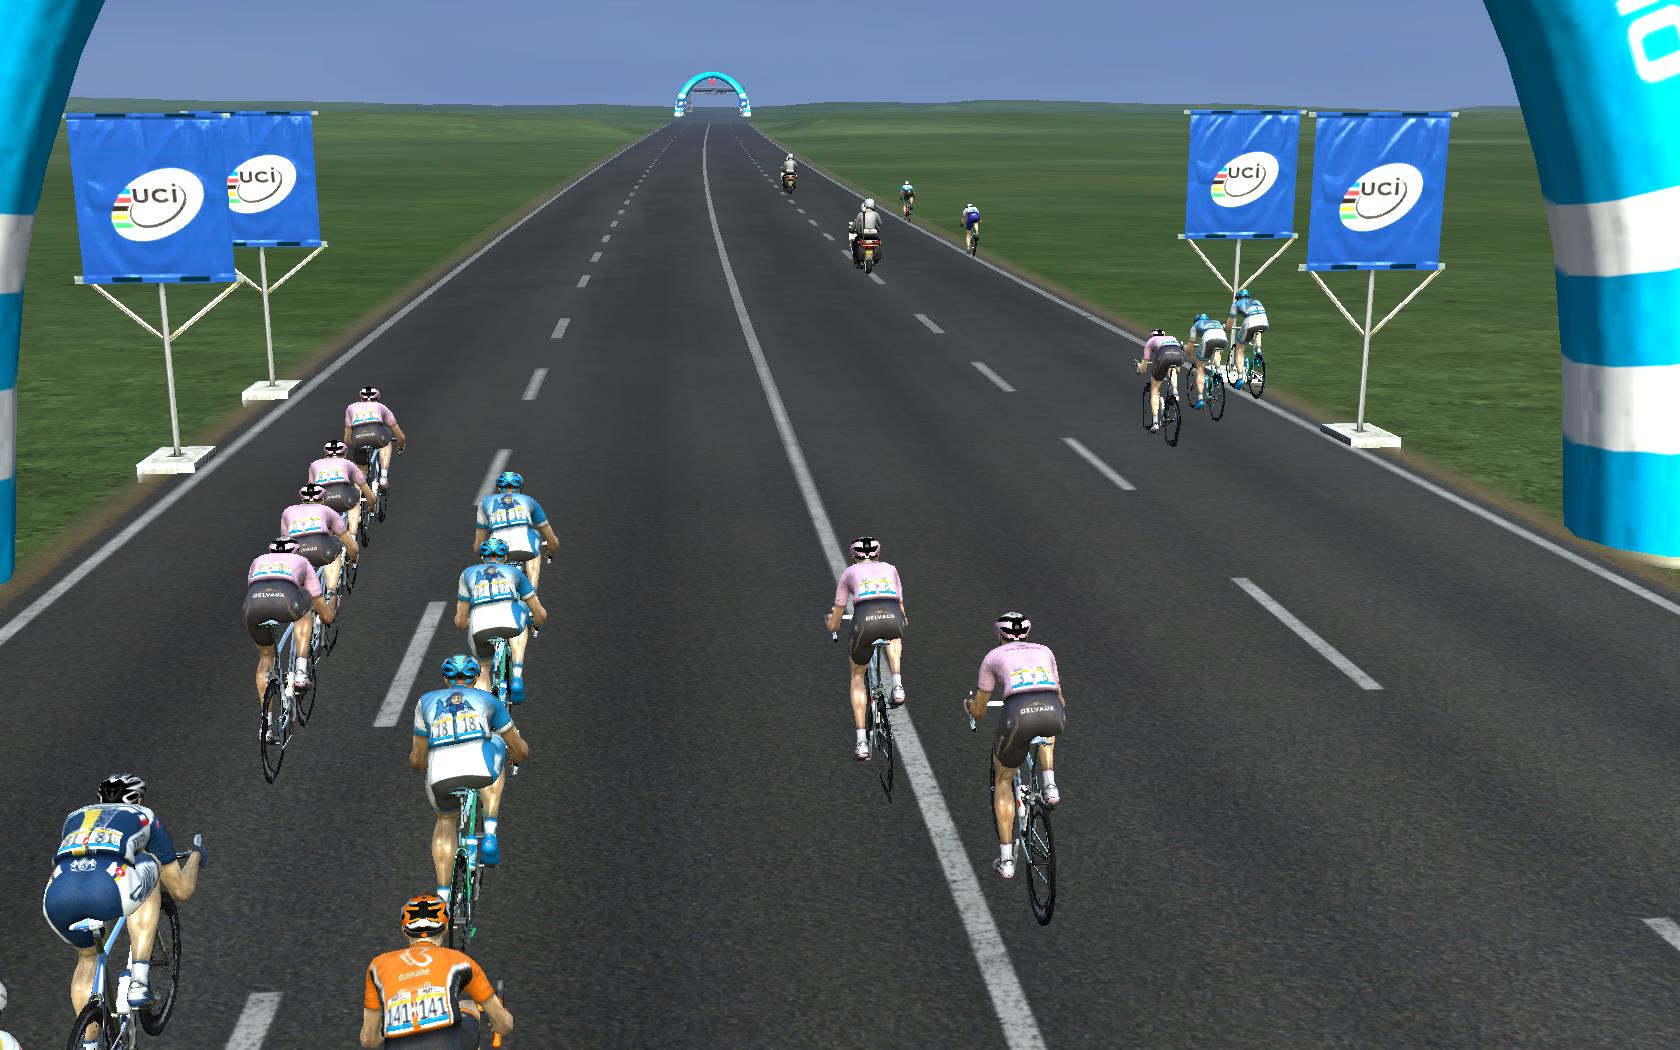 pcmdaily.com/images/mg/2018/Races/C2/USAPCC/1/PCM0008.jpg